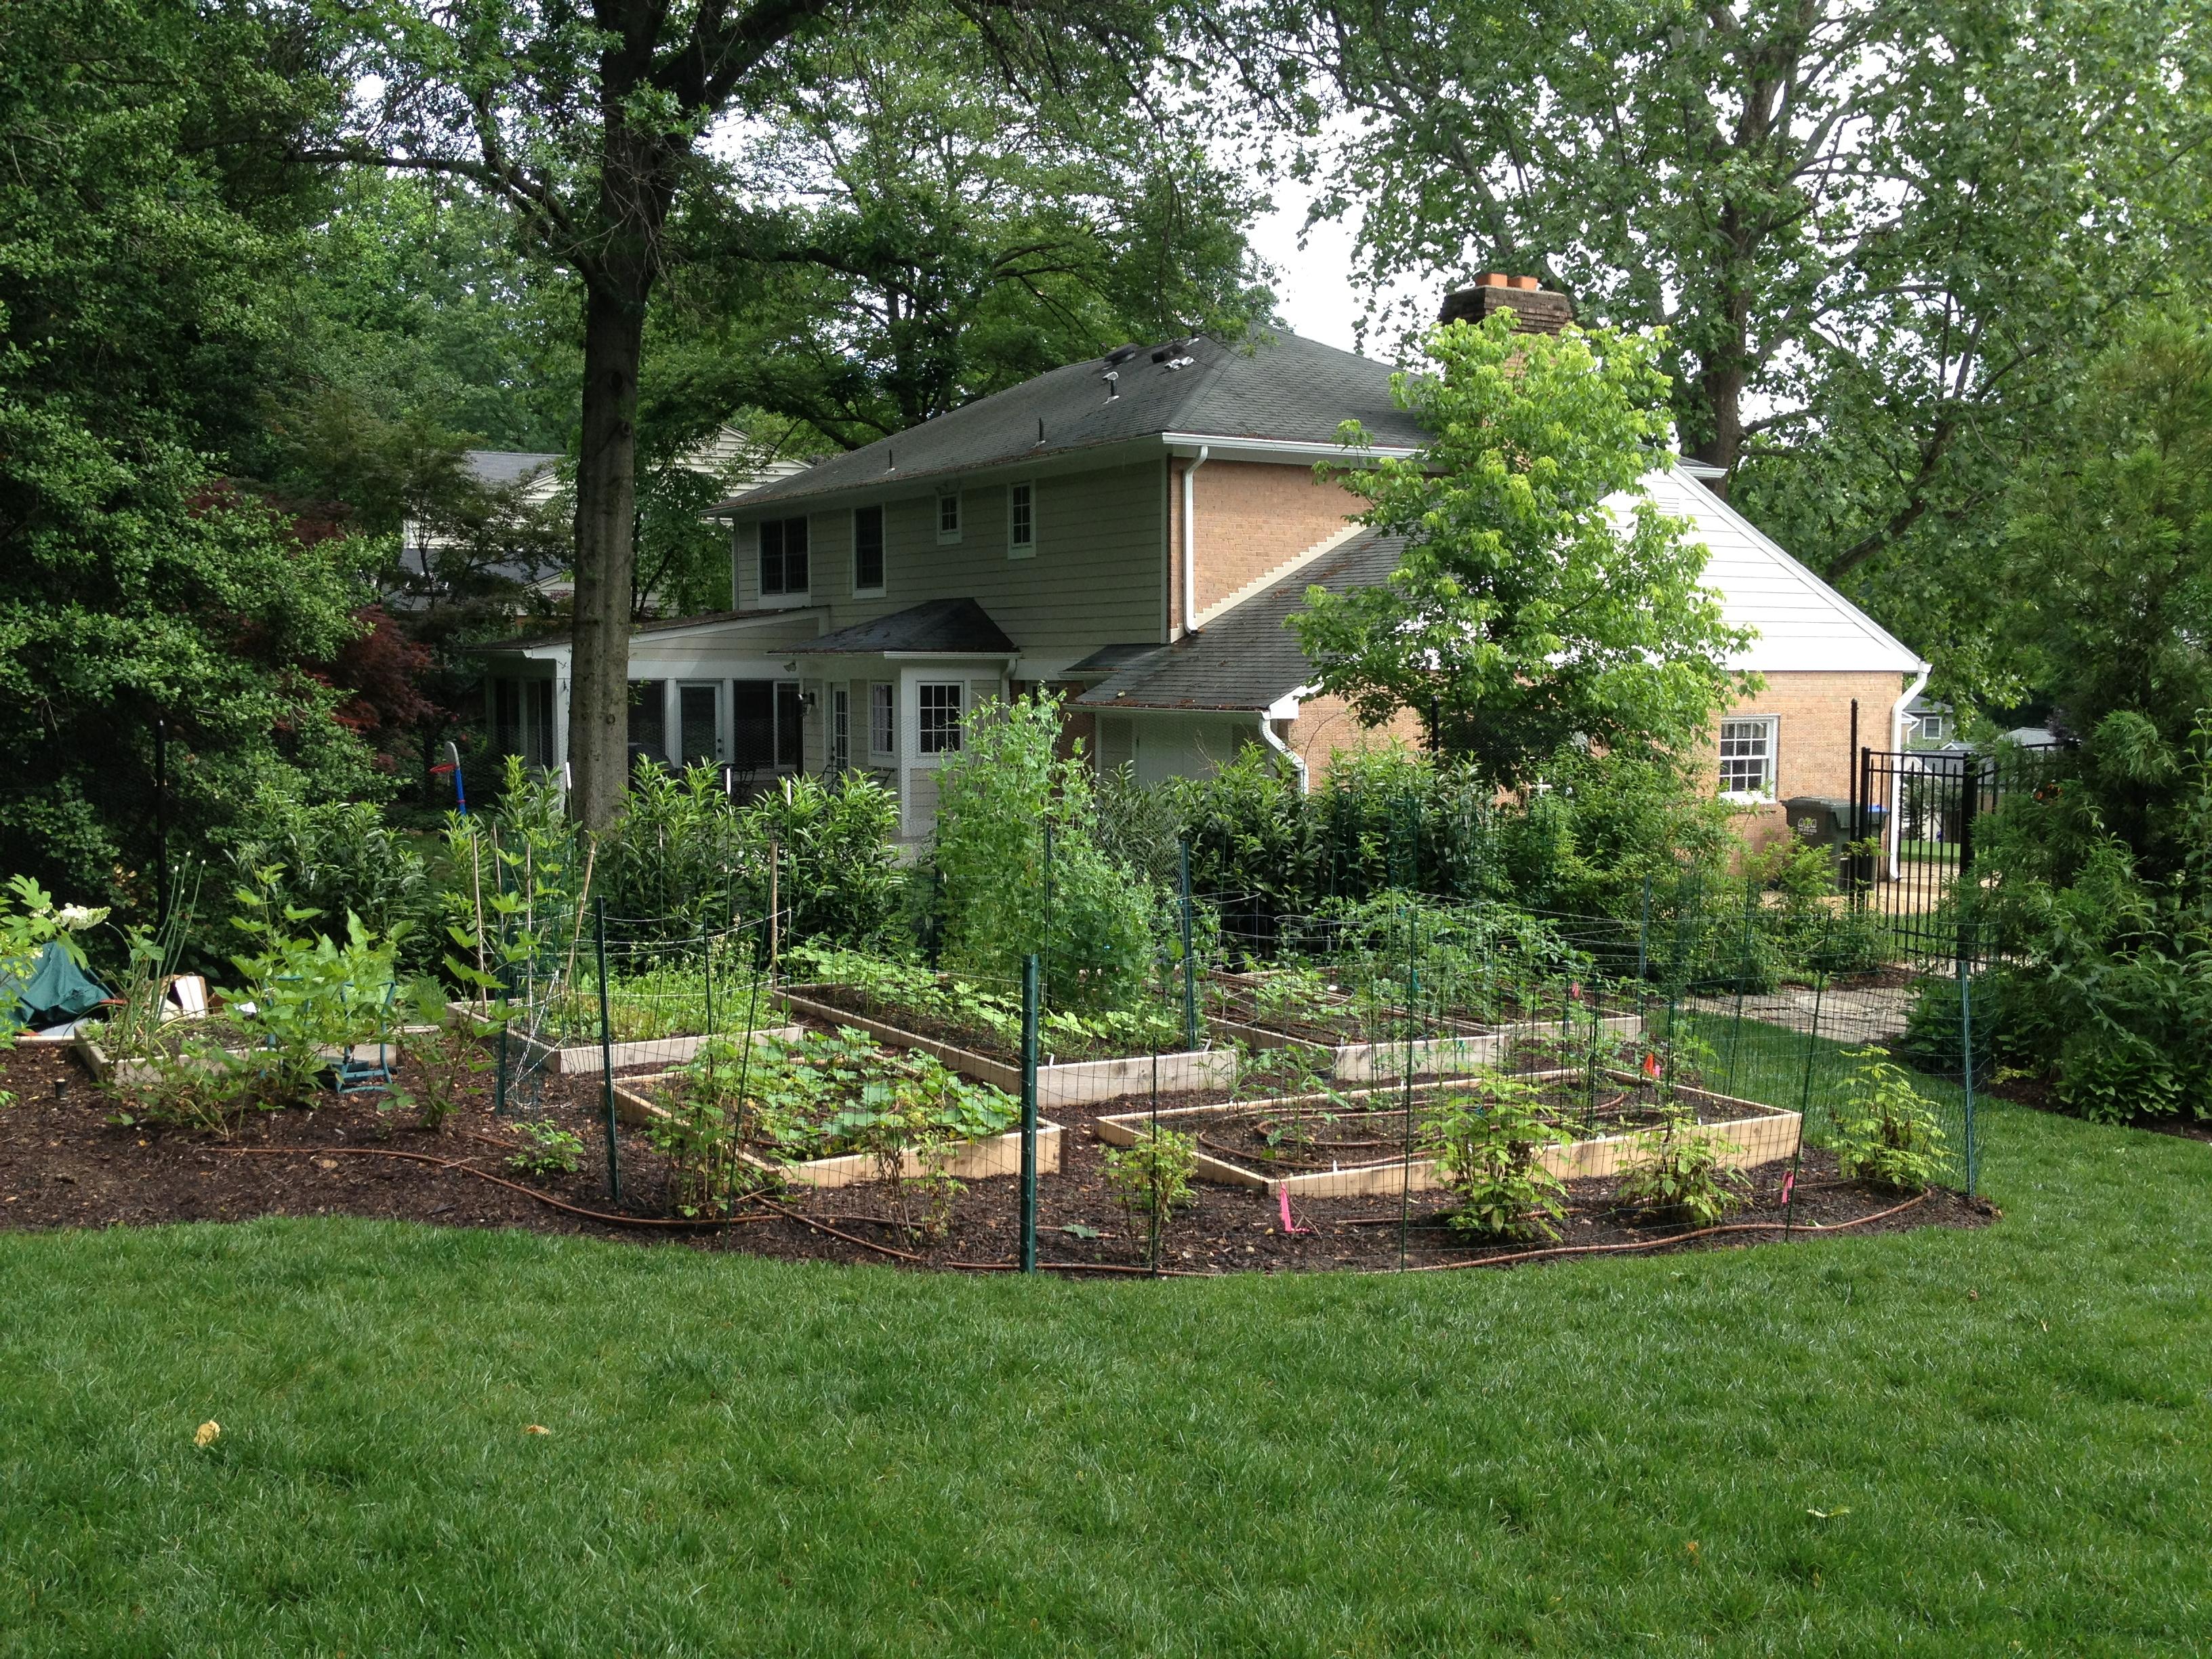 Backyard abundance!